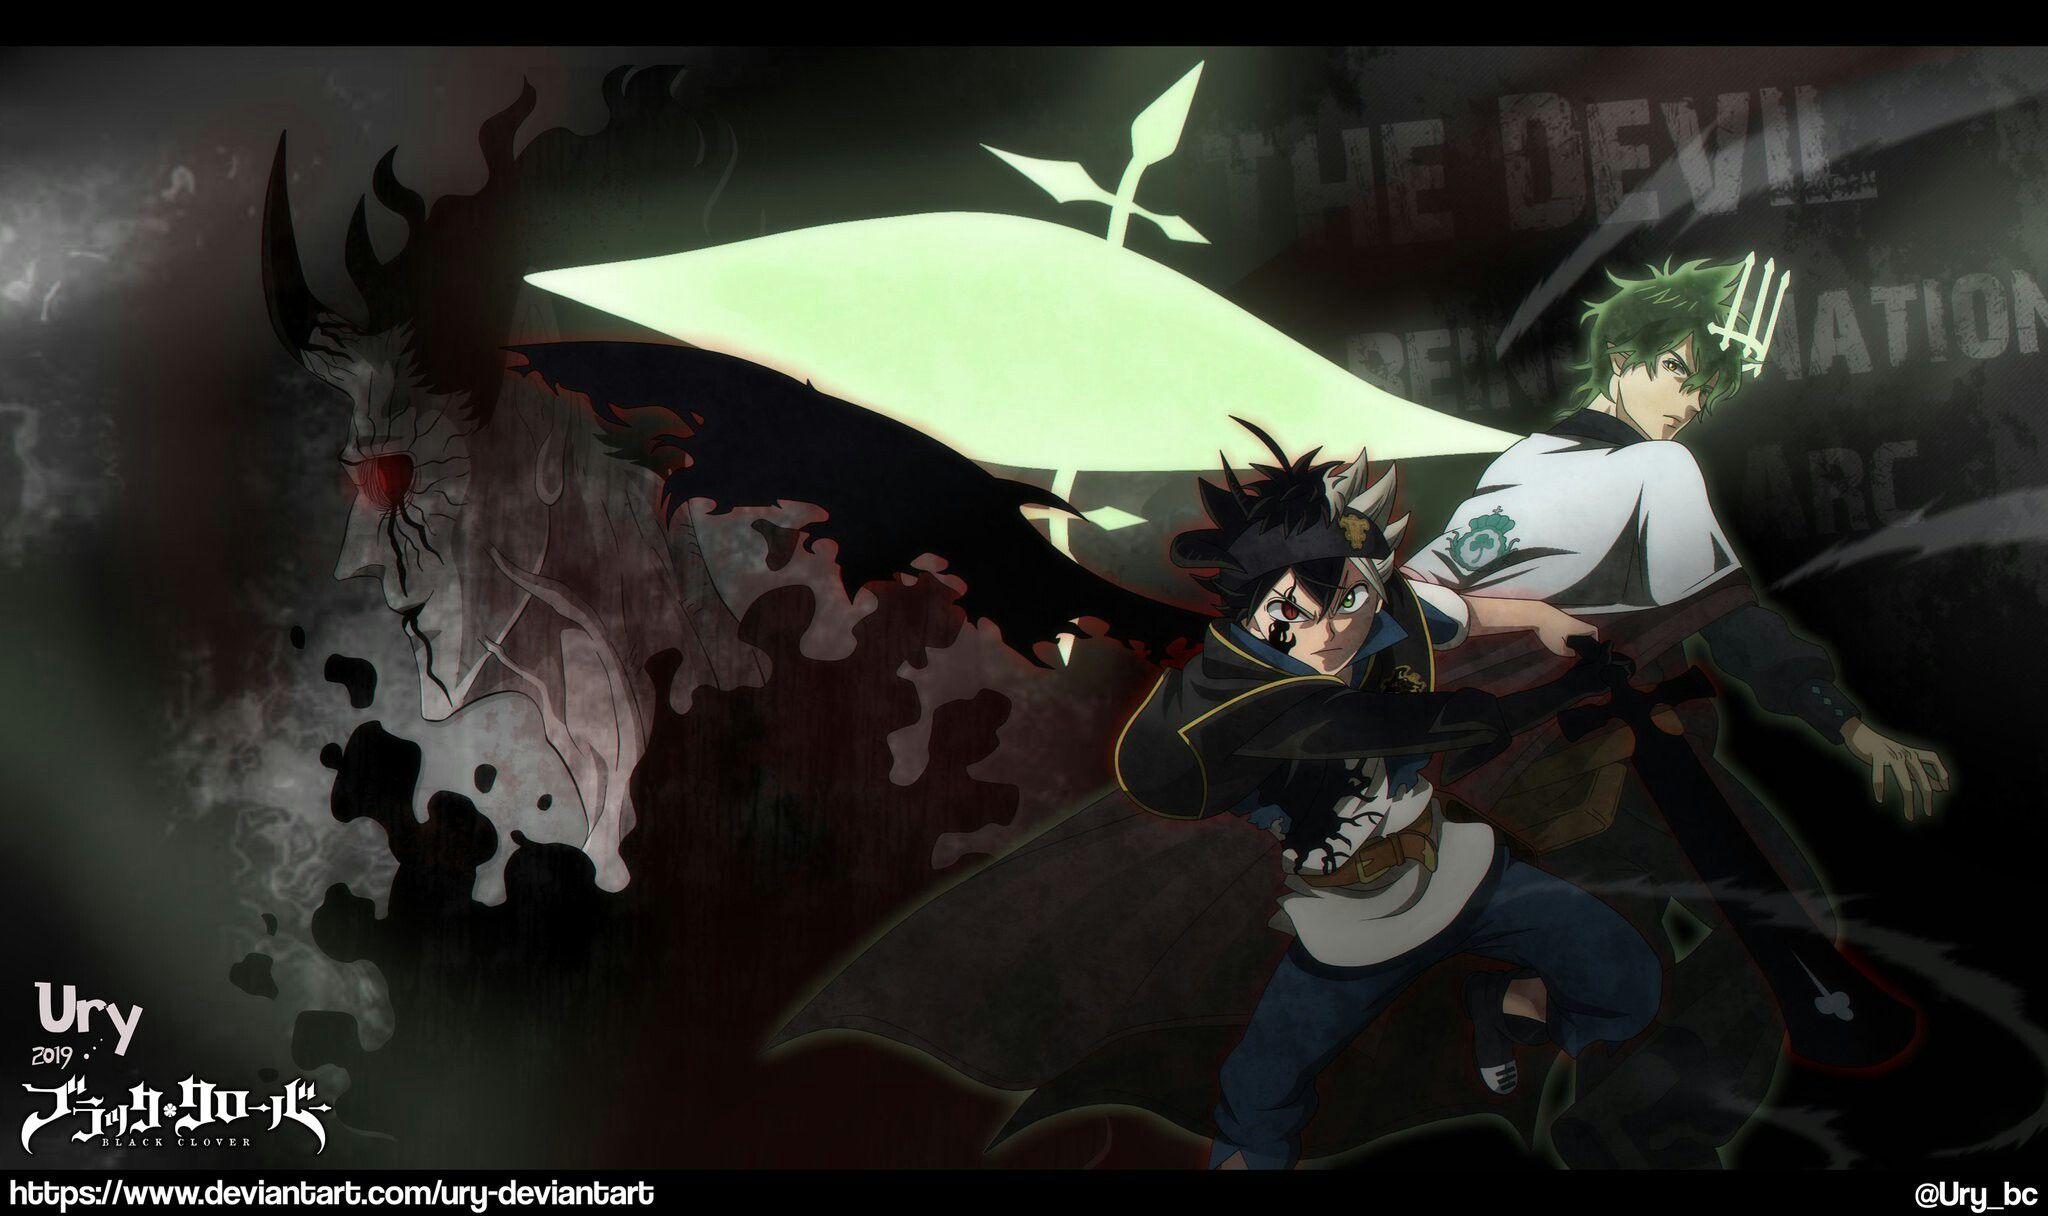 Asta E Yuno Black Clover Art By Ury Black Clover Anime Digital Artist Artist